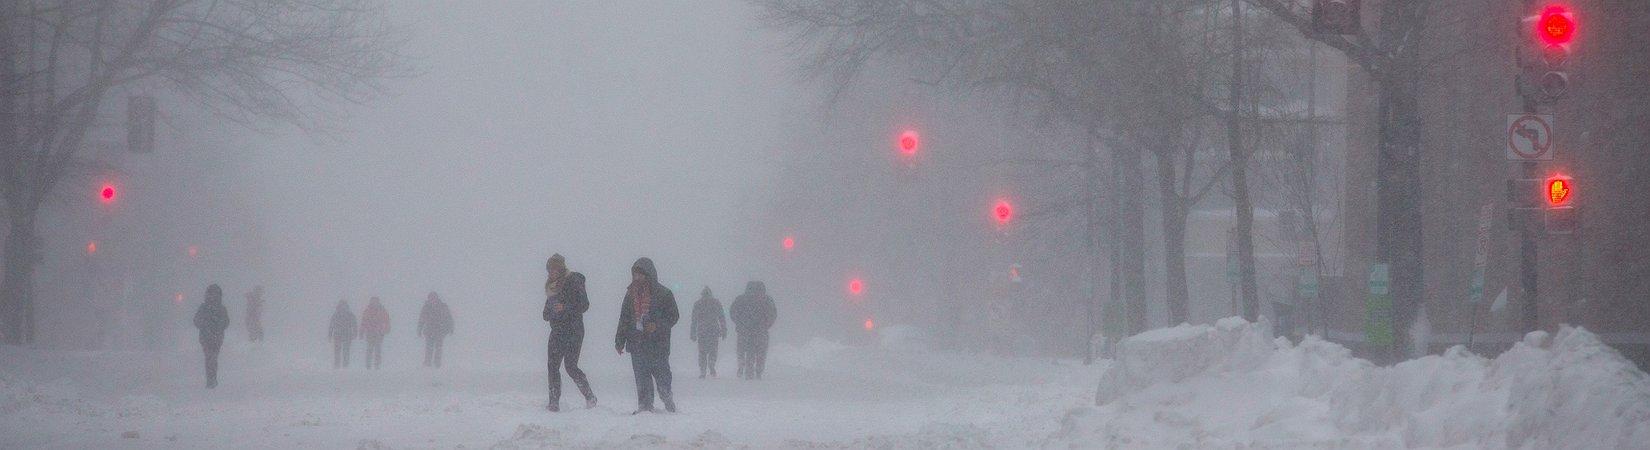 Amerika im Schnee